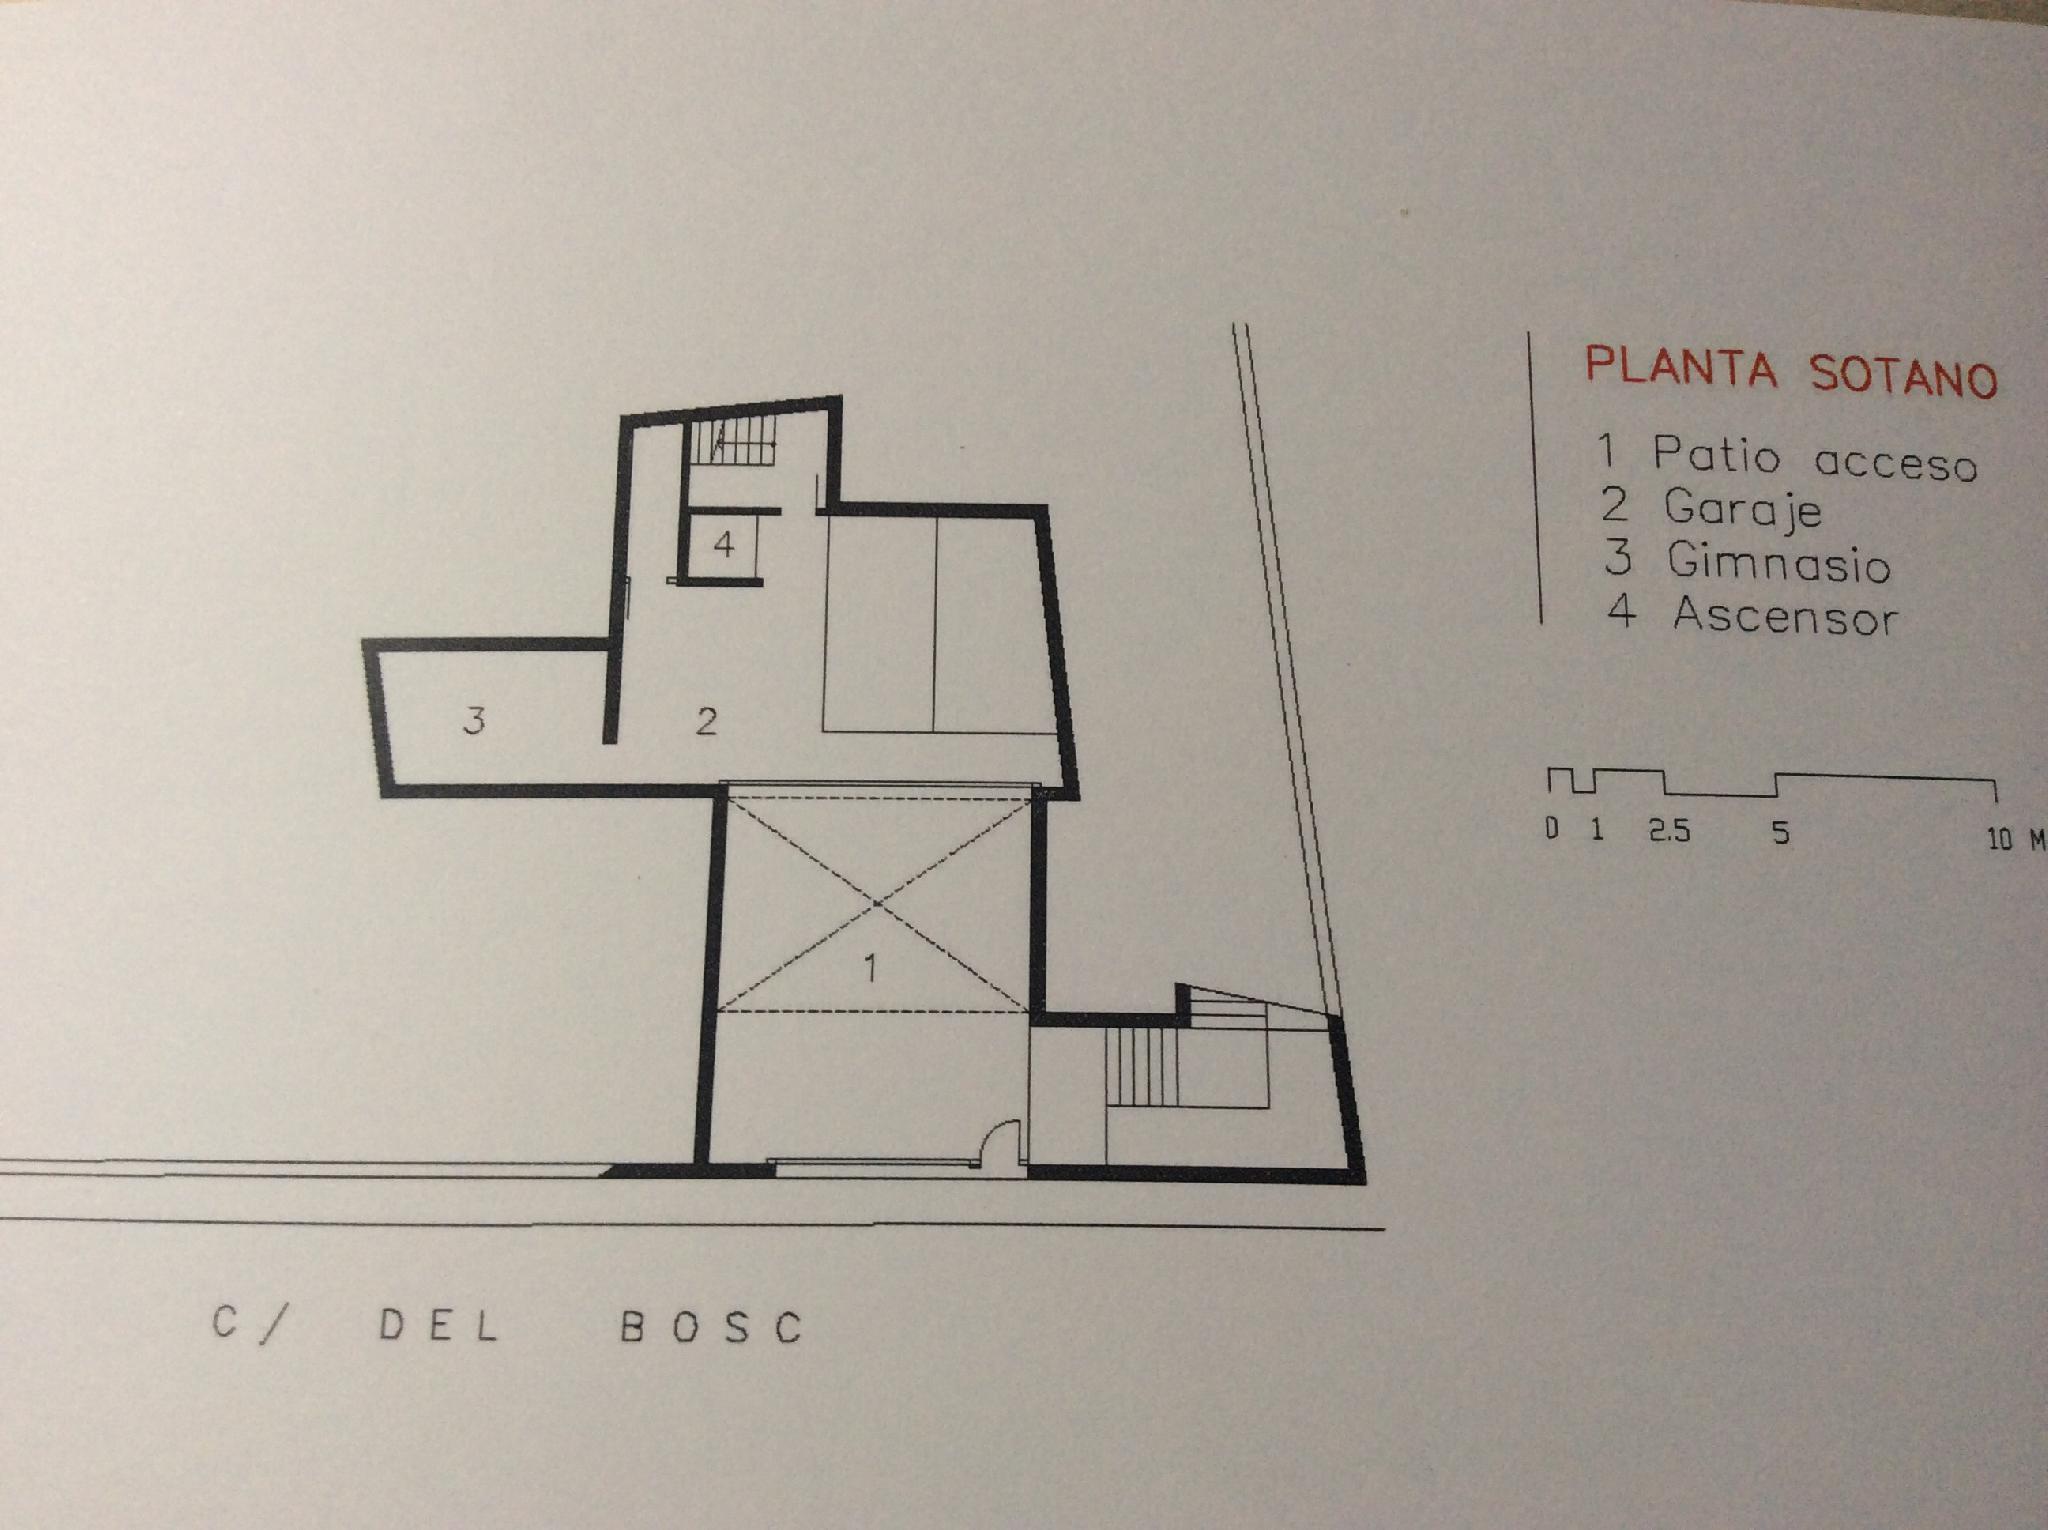 100069 Solar Urbano en venda en Sarrià-Sant Gervasi, Tres Torres 10